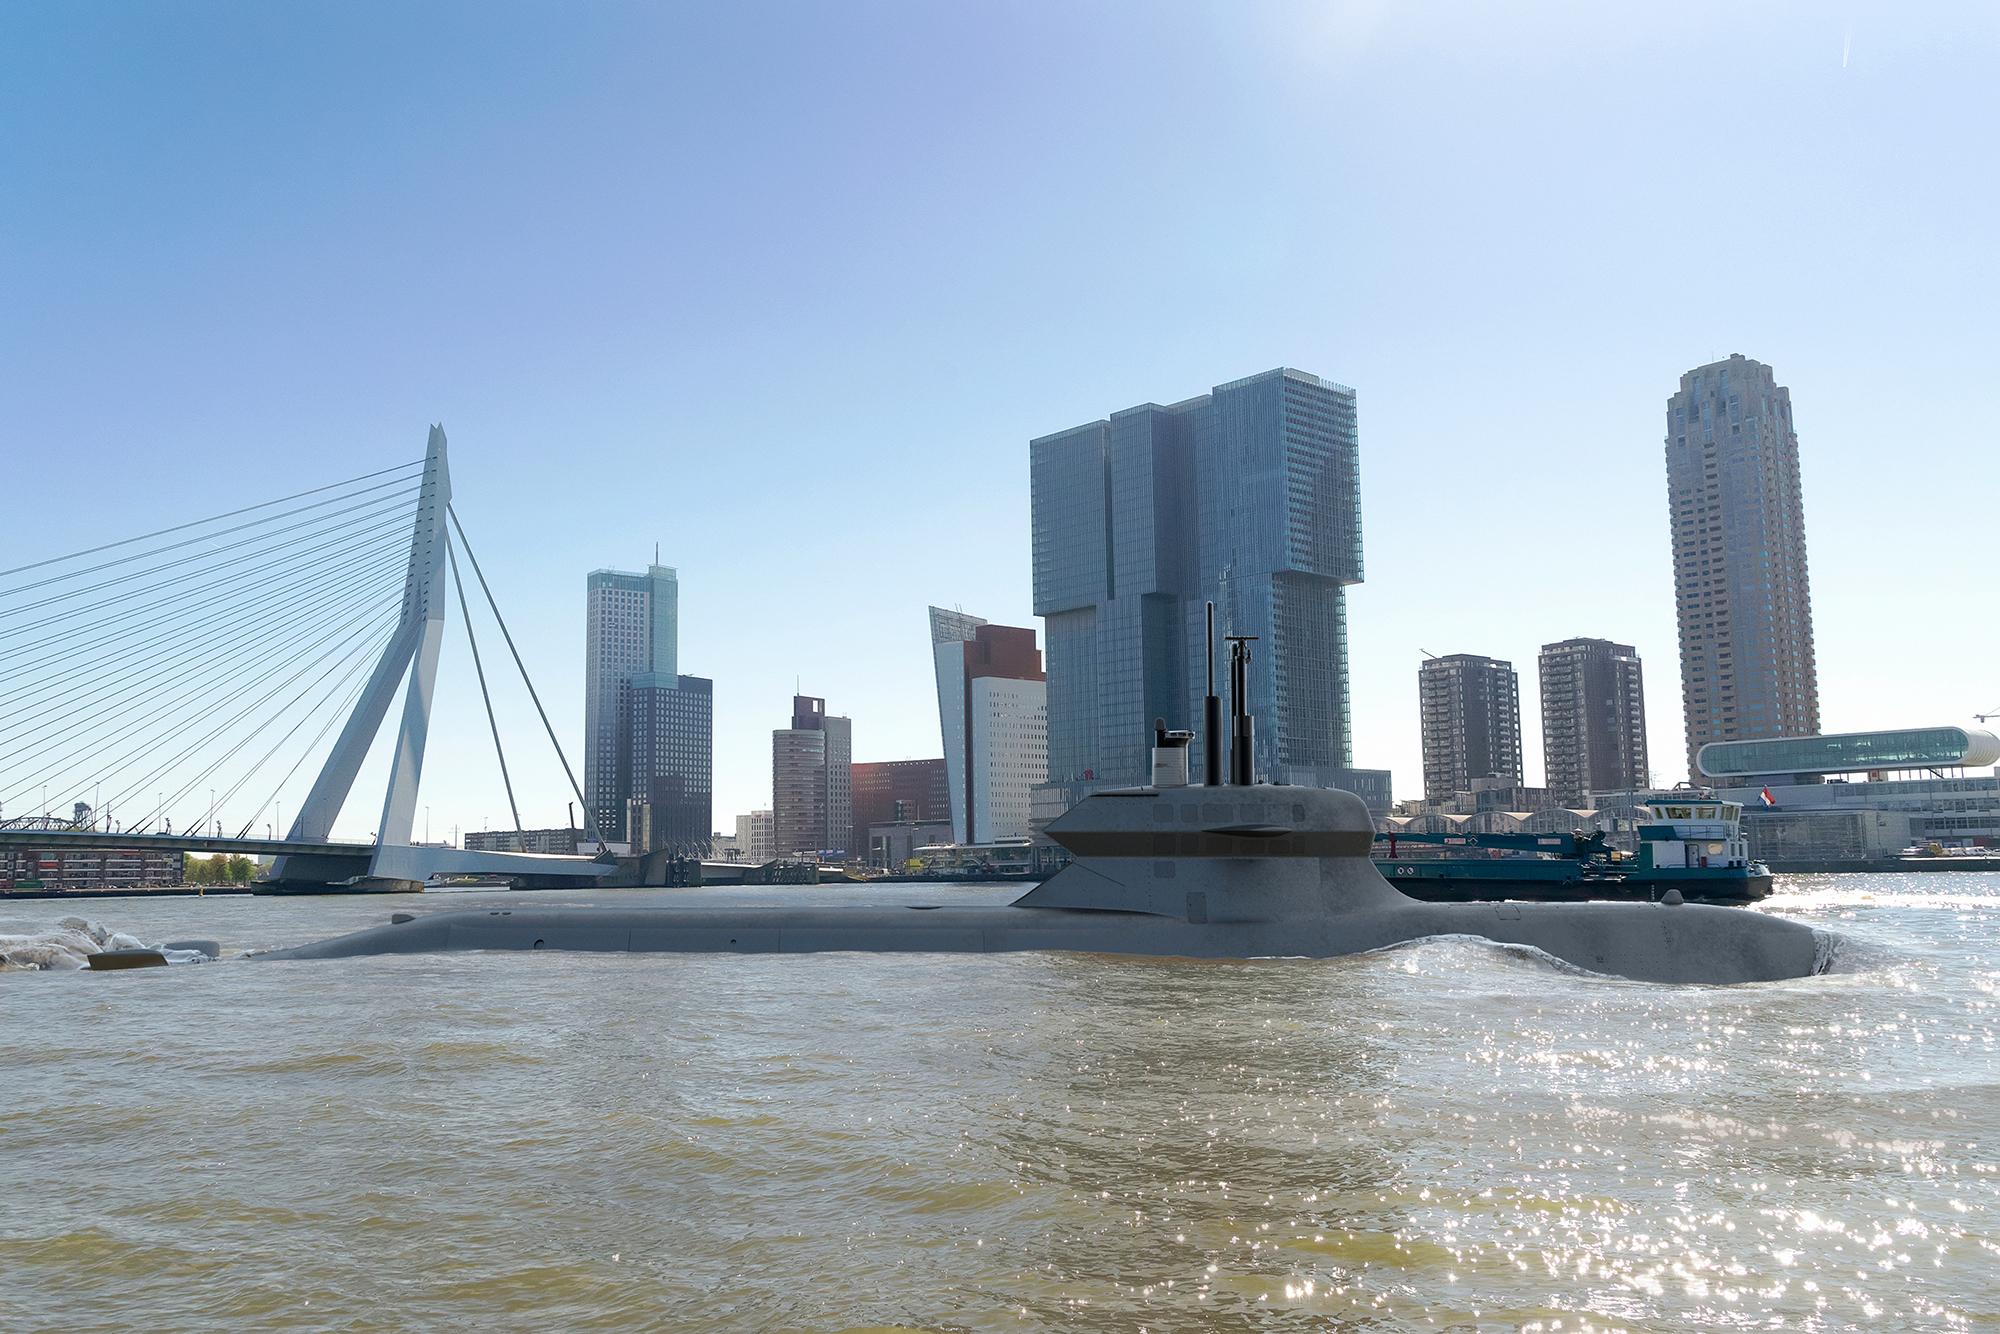 'Dutch' A26 Rotterdam_Expeditionary_submarine_Saab-Damen, Saab Damen